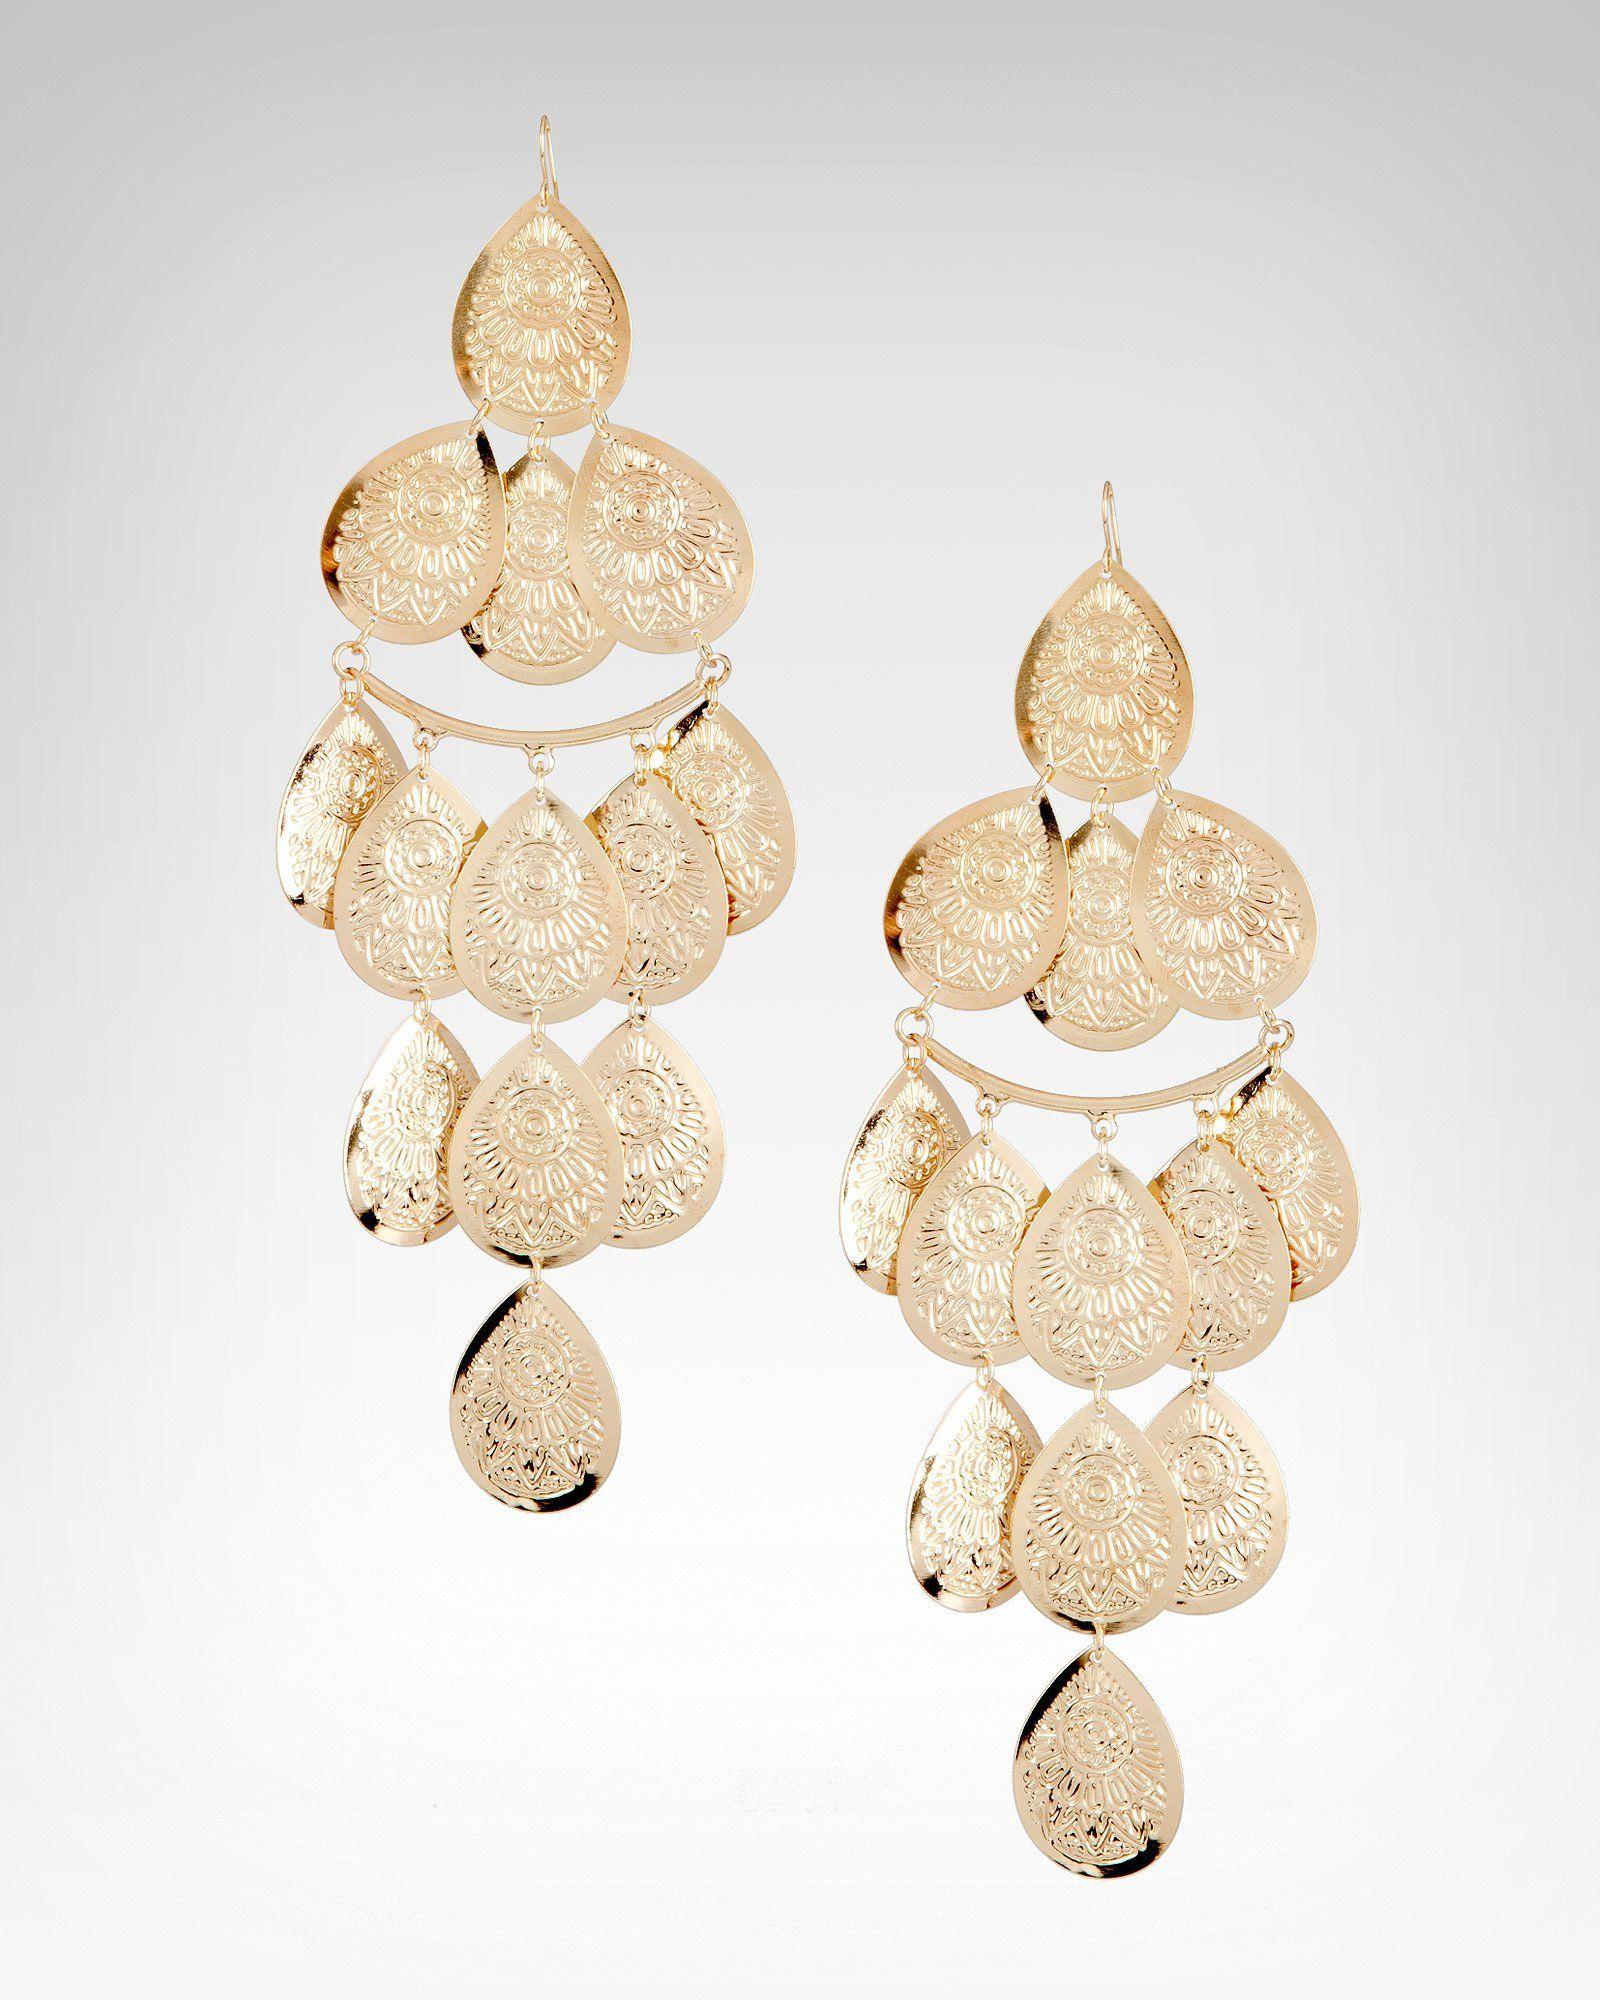 Bebe Tribal Printed Tiered Earring Pinterest Your Way Across The U K Engraved Jewelrymetal